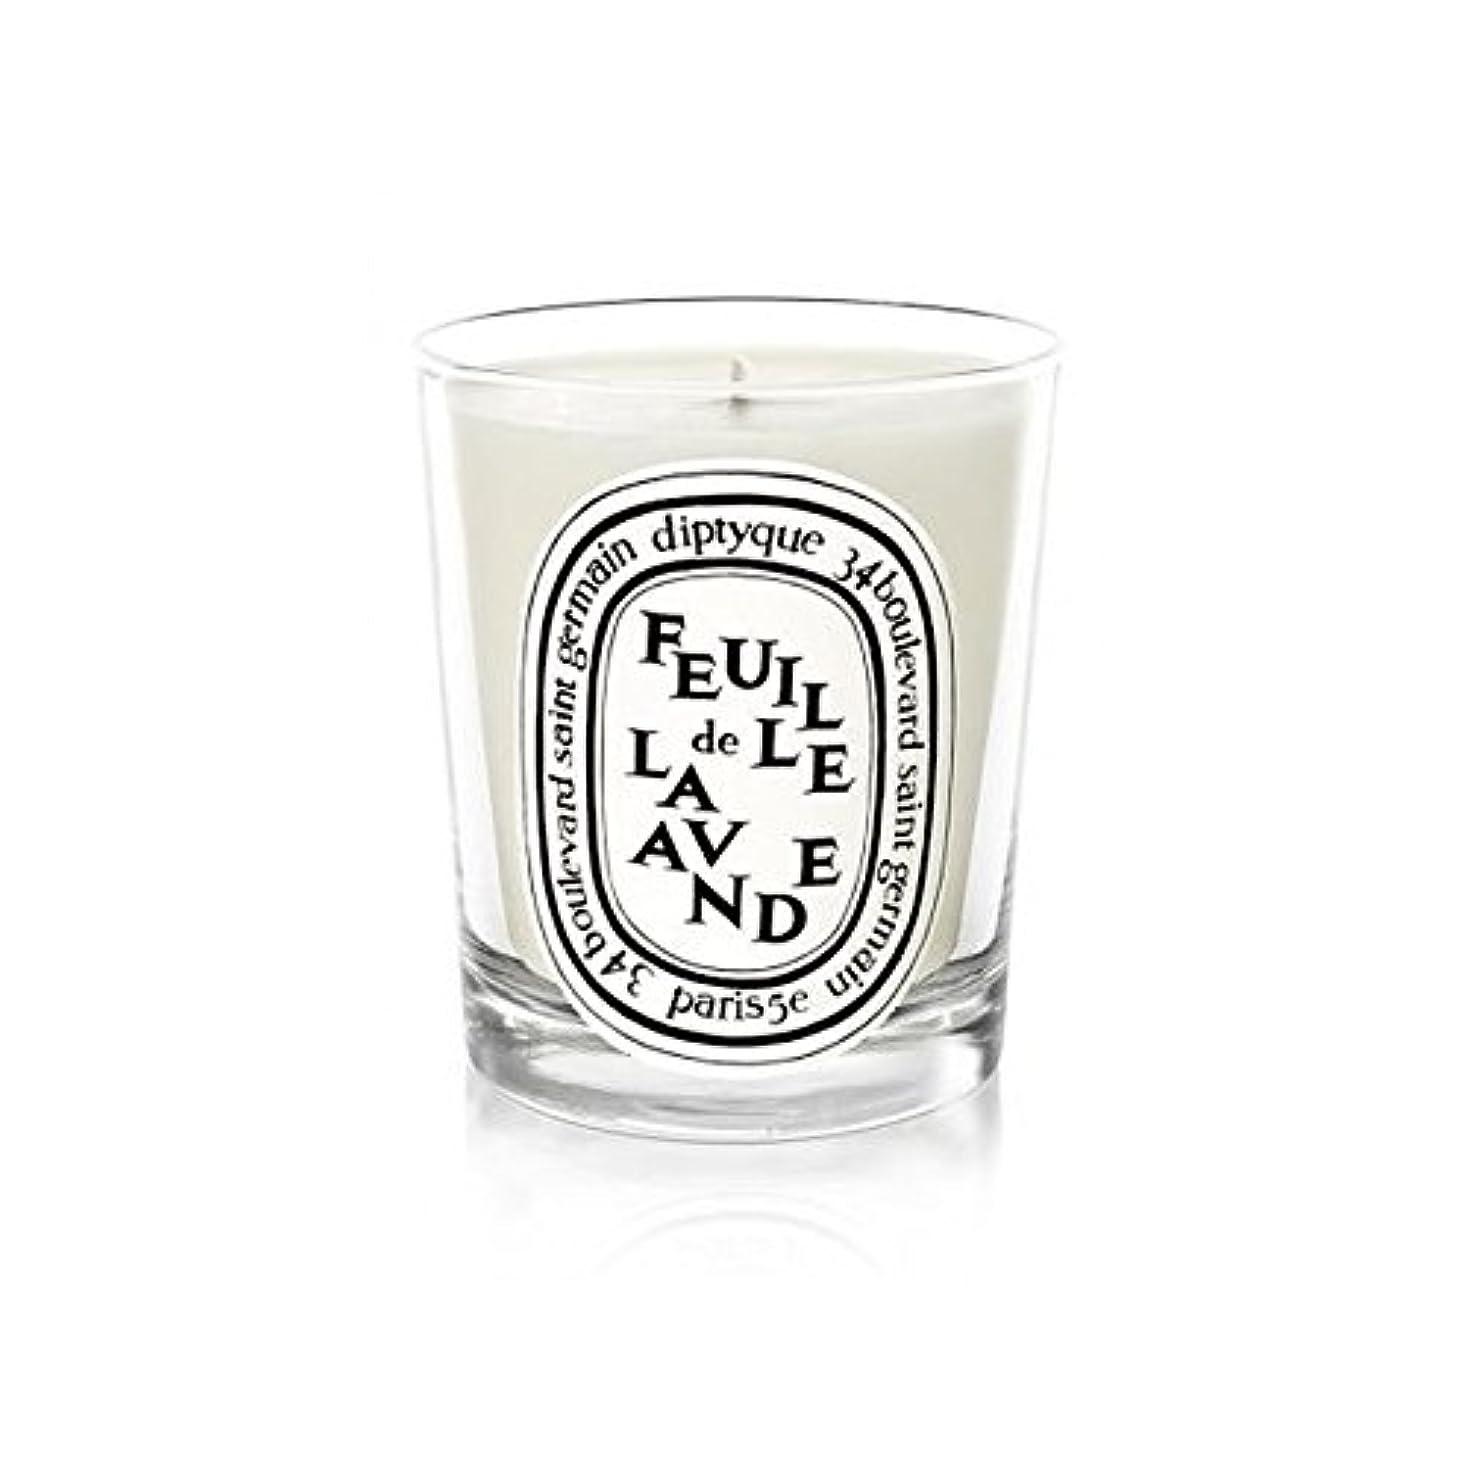 Diptyque Candle Feuille De Lavande / Lavender Leaf 190g (Pack of 6) - DiptyqueのキャンドルFeuilleデラバンデ/ラベンダーの葉190グラム...